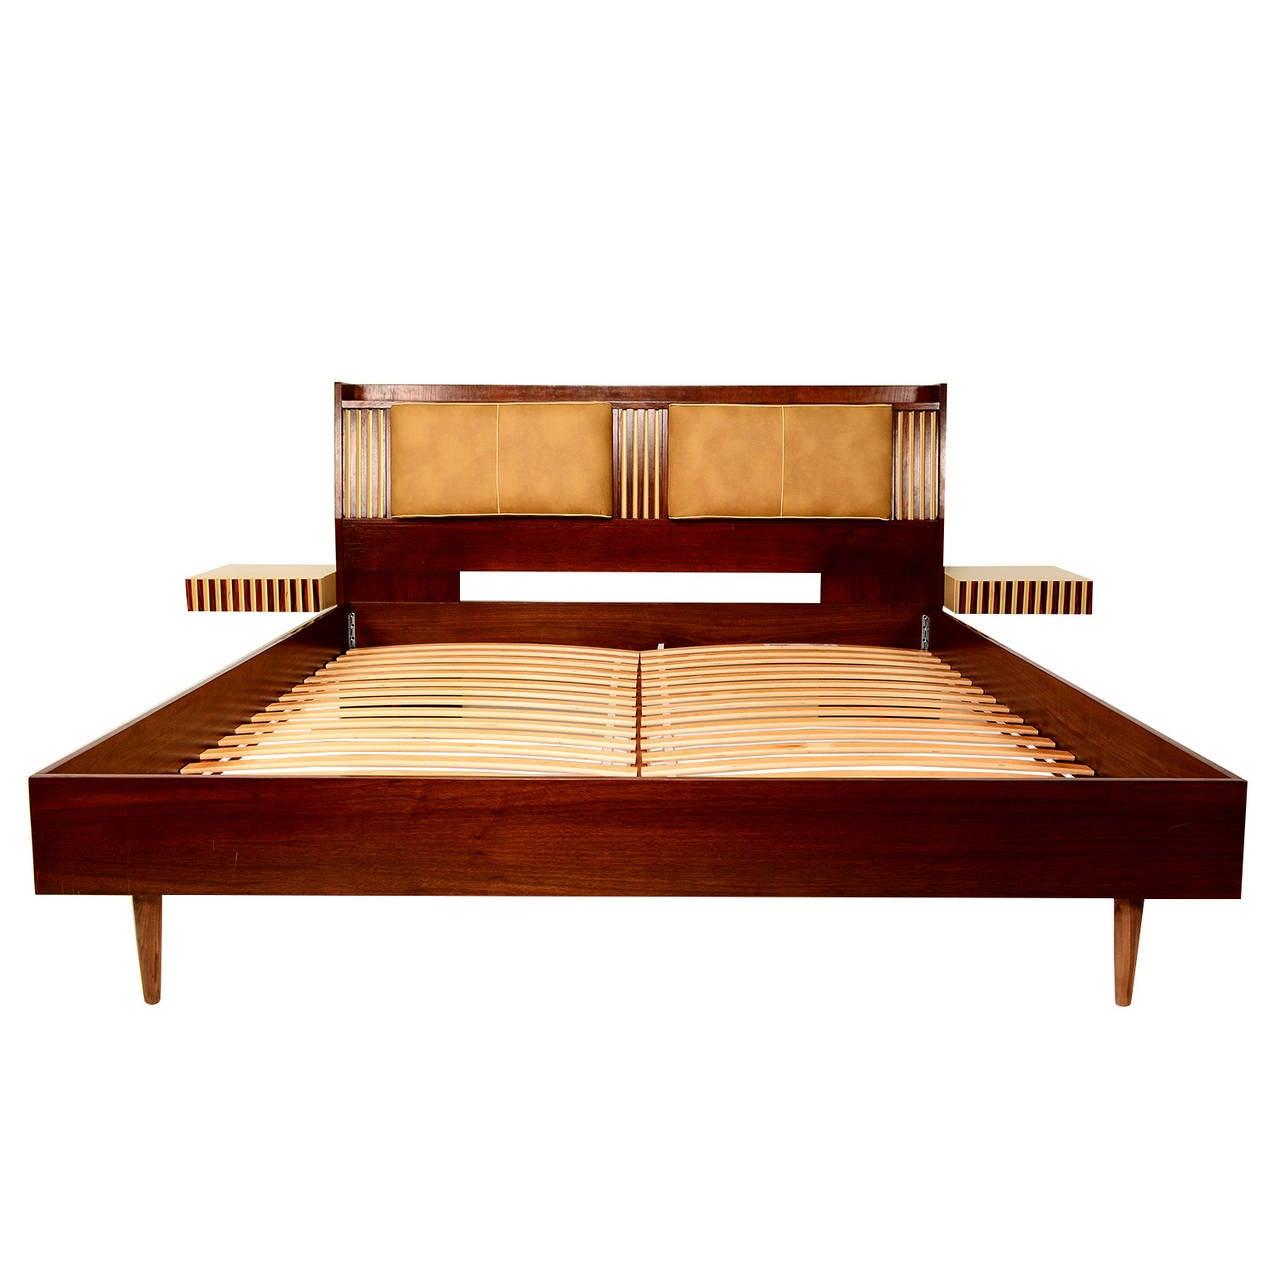 Solid wood bed platform with nightstands